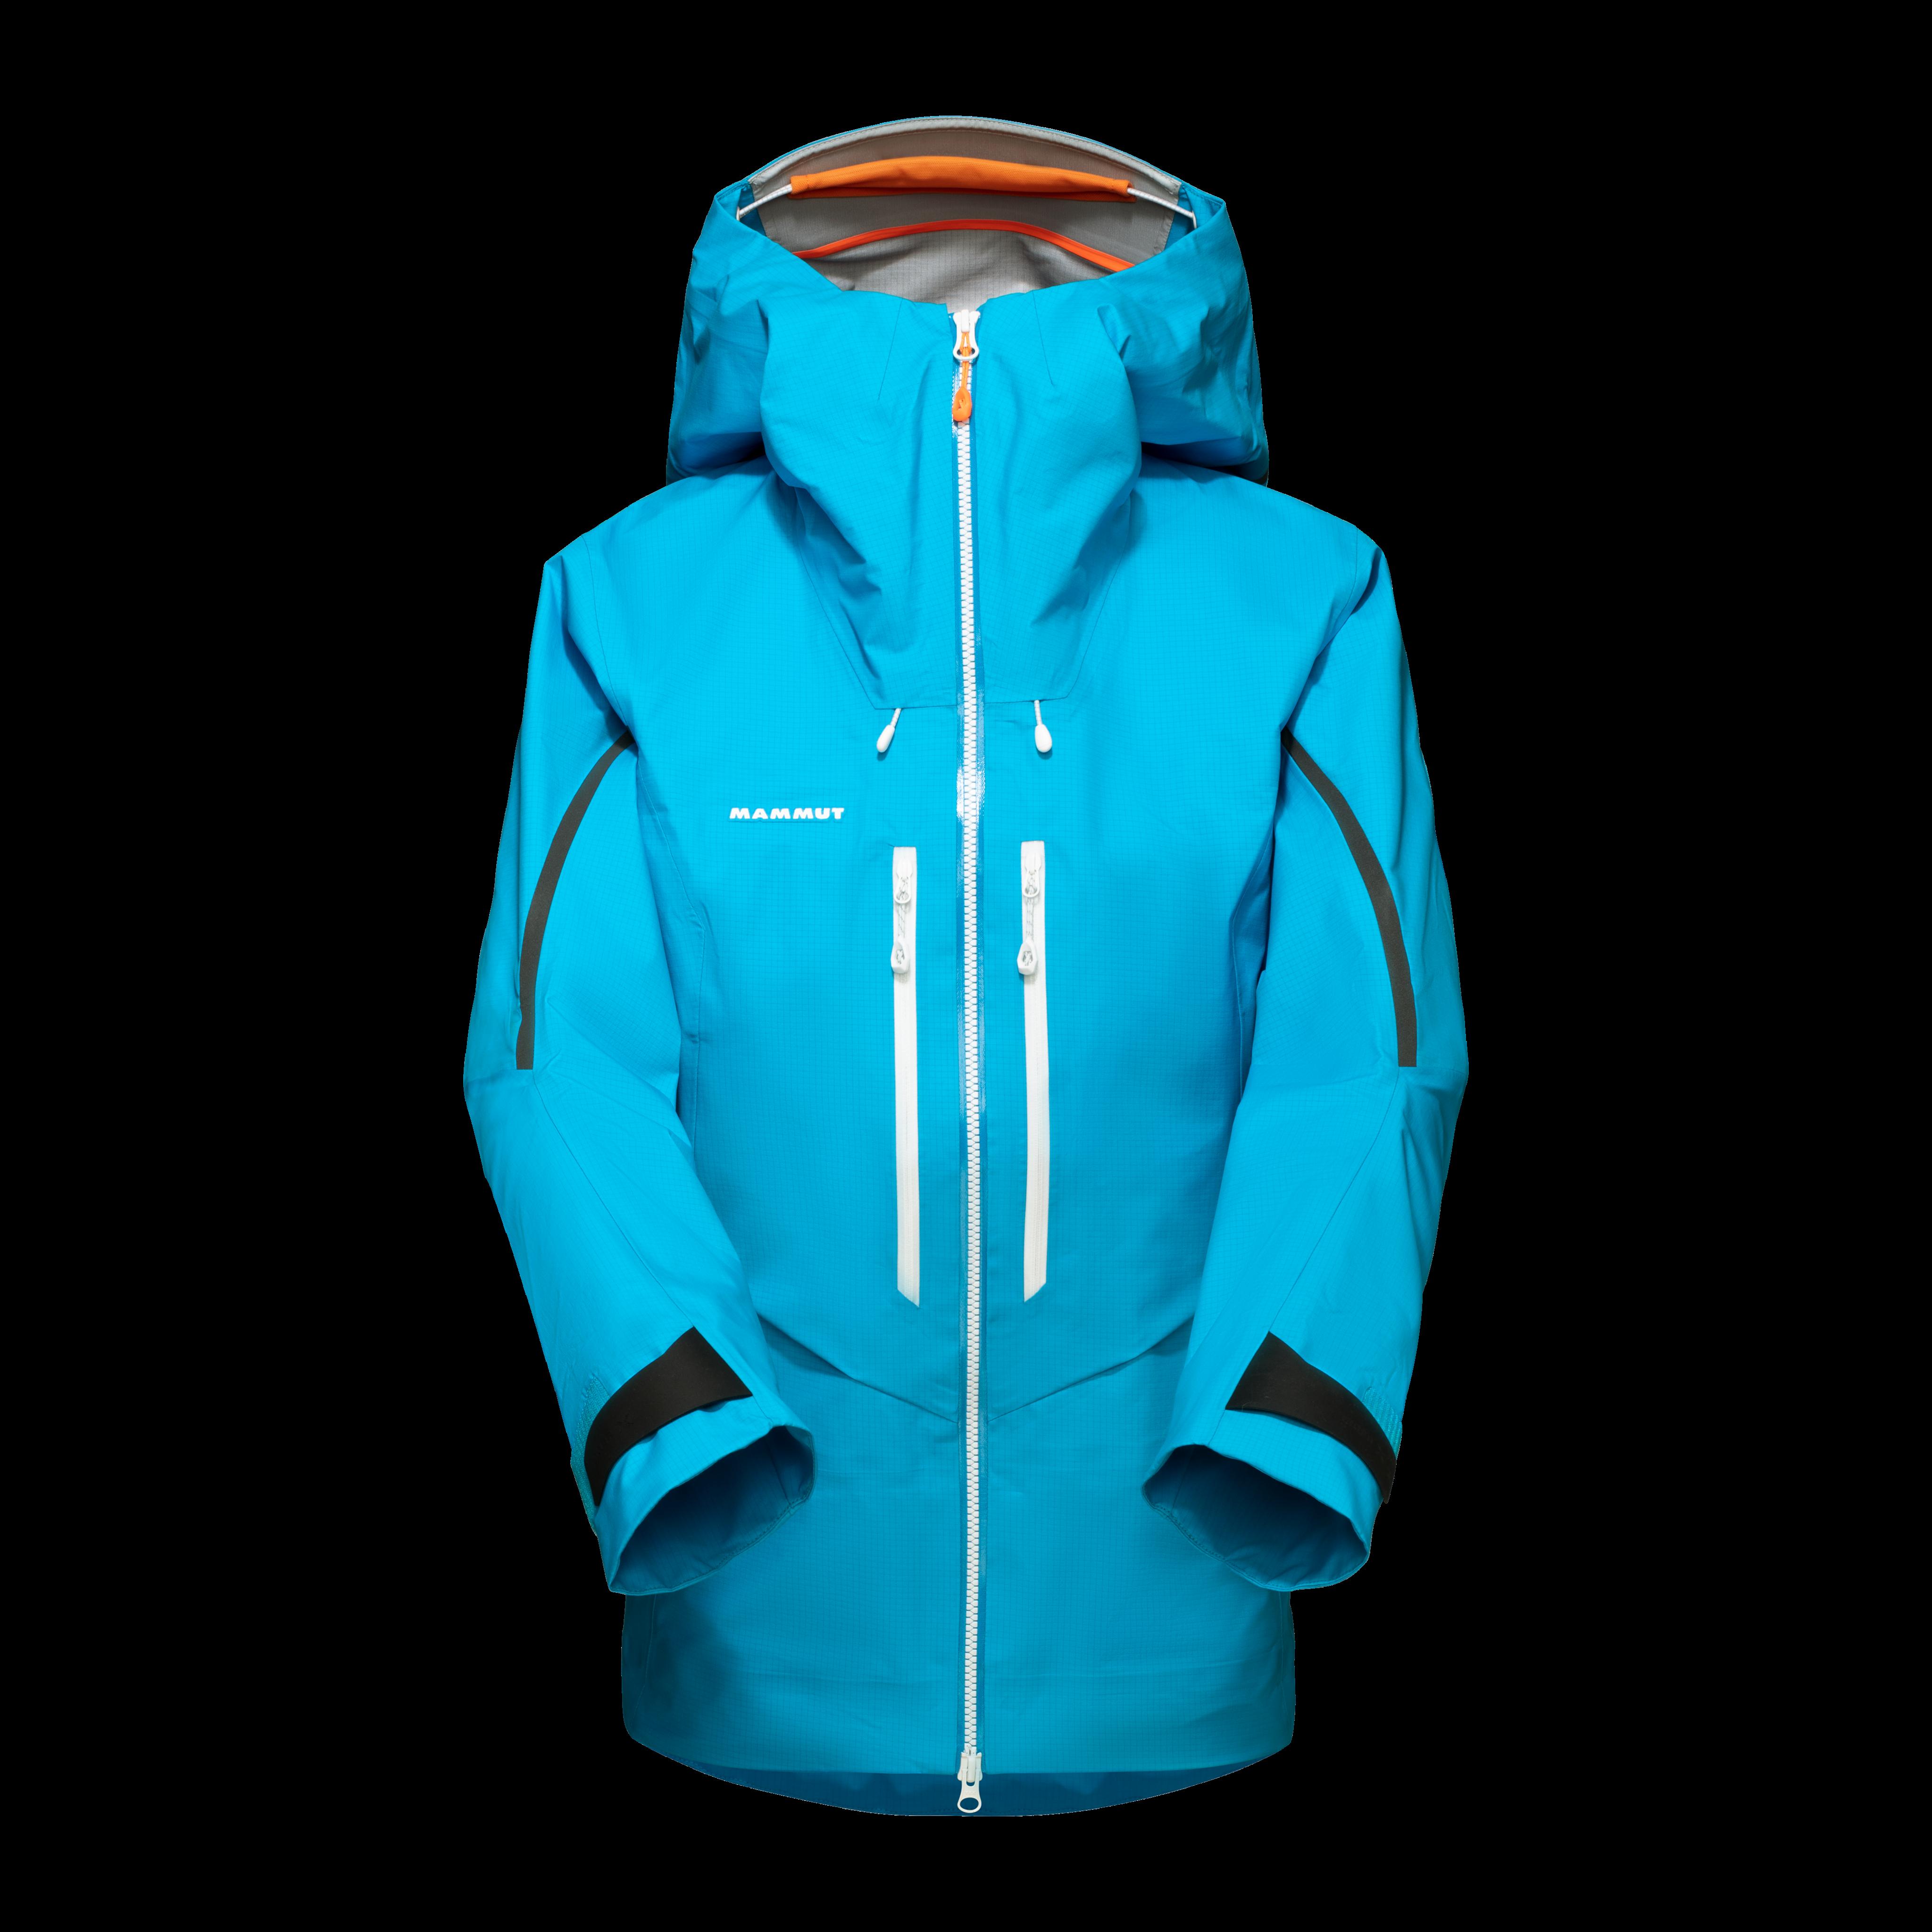 Nordwand Advanced HS Hooded Jacket Women - M, sky thumbnail